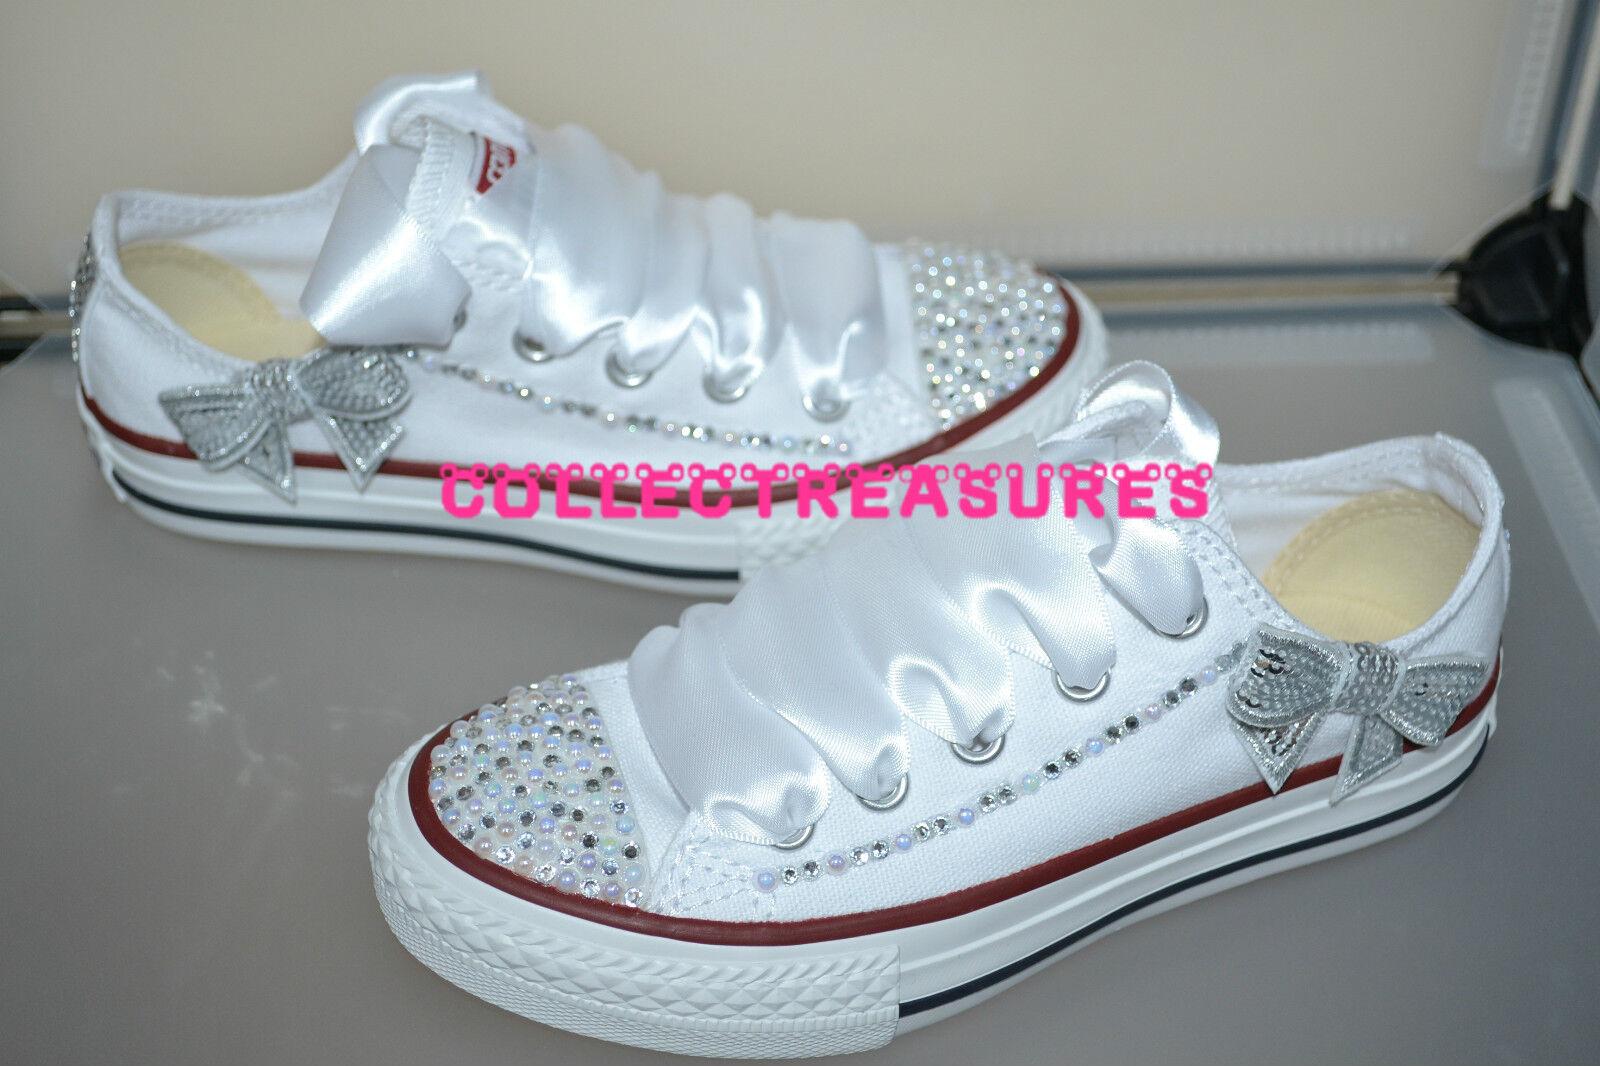 Custom Crystal Diamante Bling Größe Wedding Weiß Lo Converse Größe Bling UK 3 4 5 6 7 8 9 47bb53